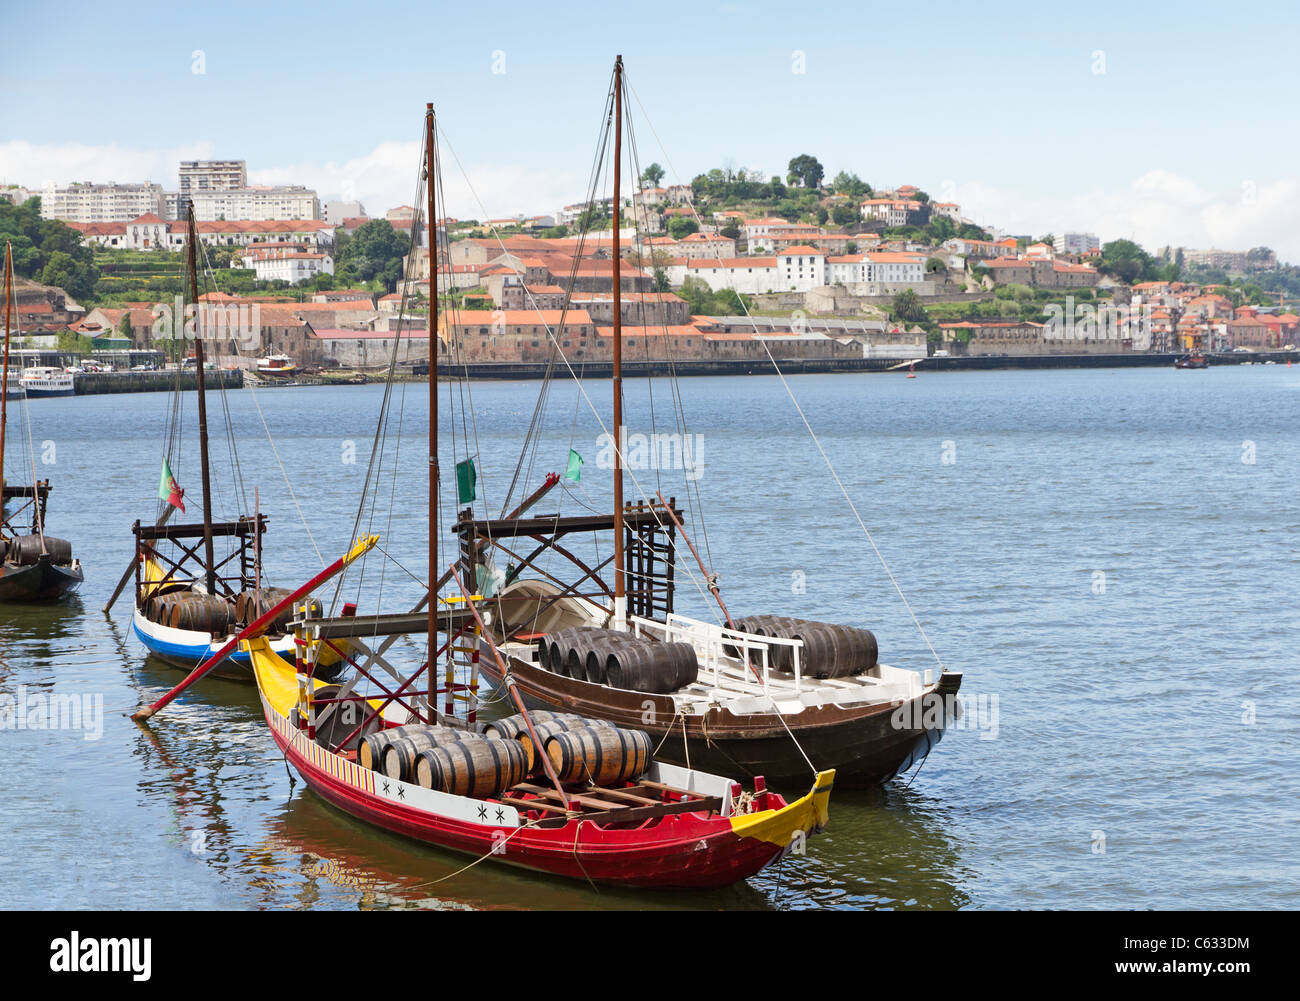 Port wine storage warehouses and transport boats at river Duoro in Vila Nova de Gaia opposite Porto, Portugal Stock Photo